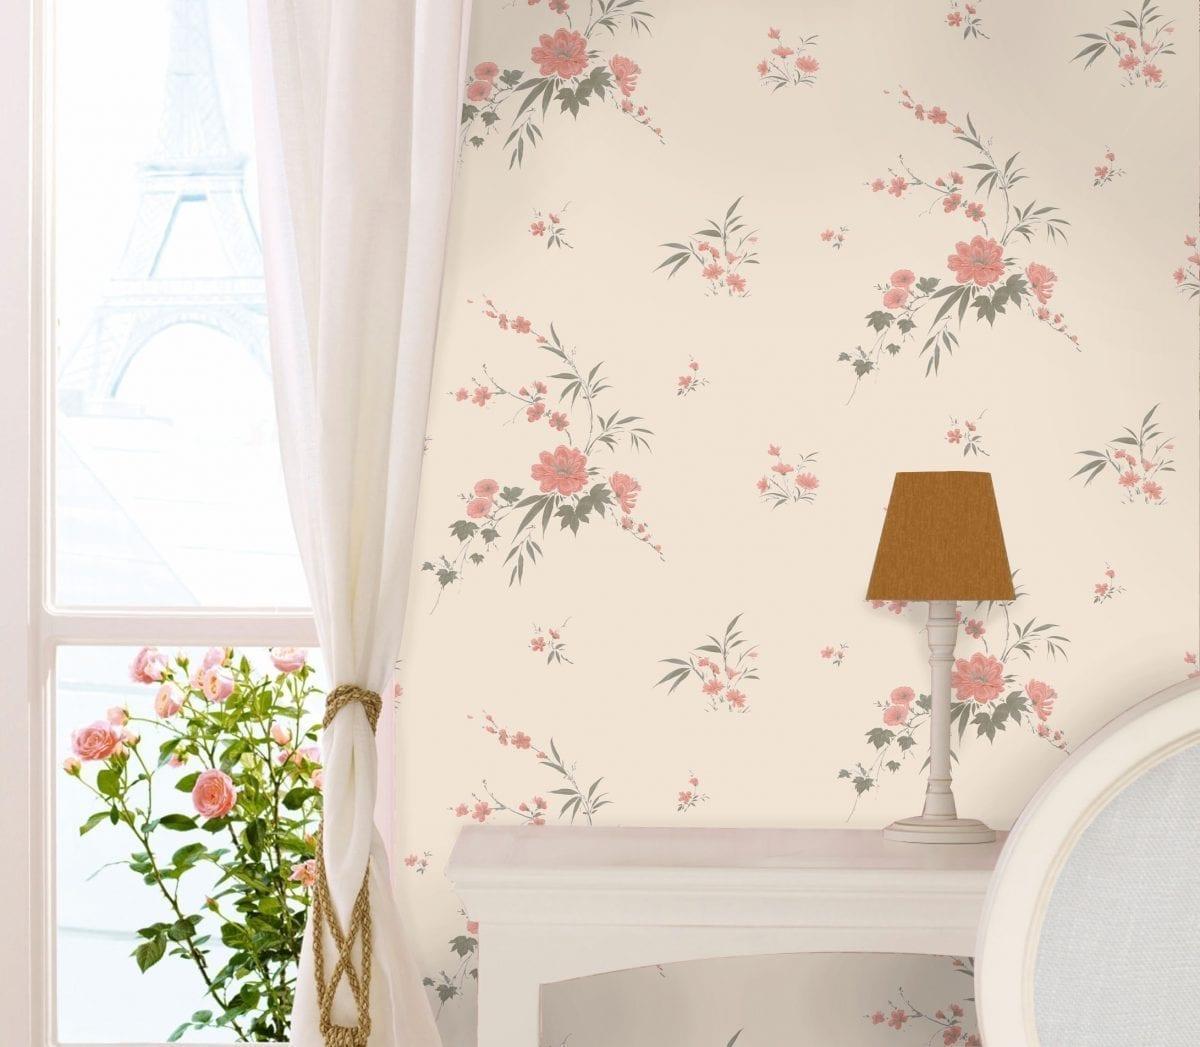 Papel mural flores 7309-2 Muresco